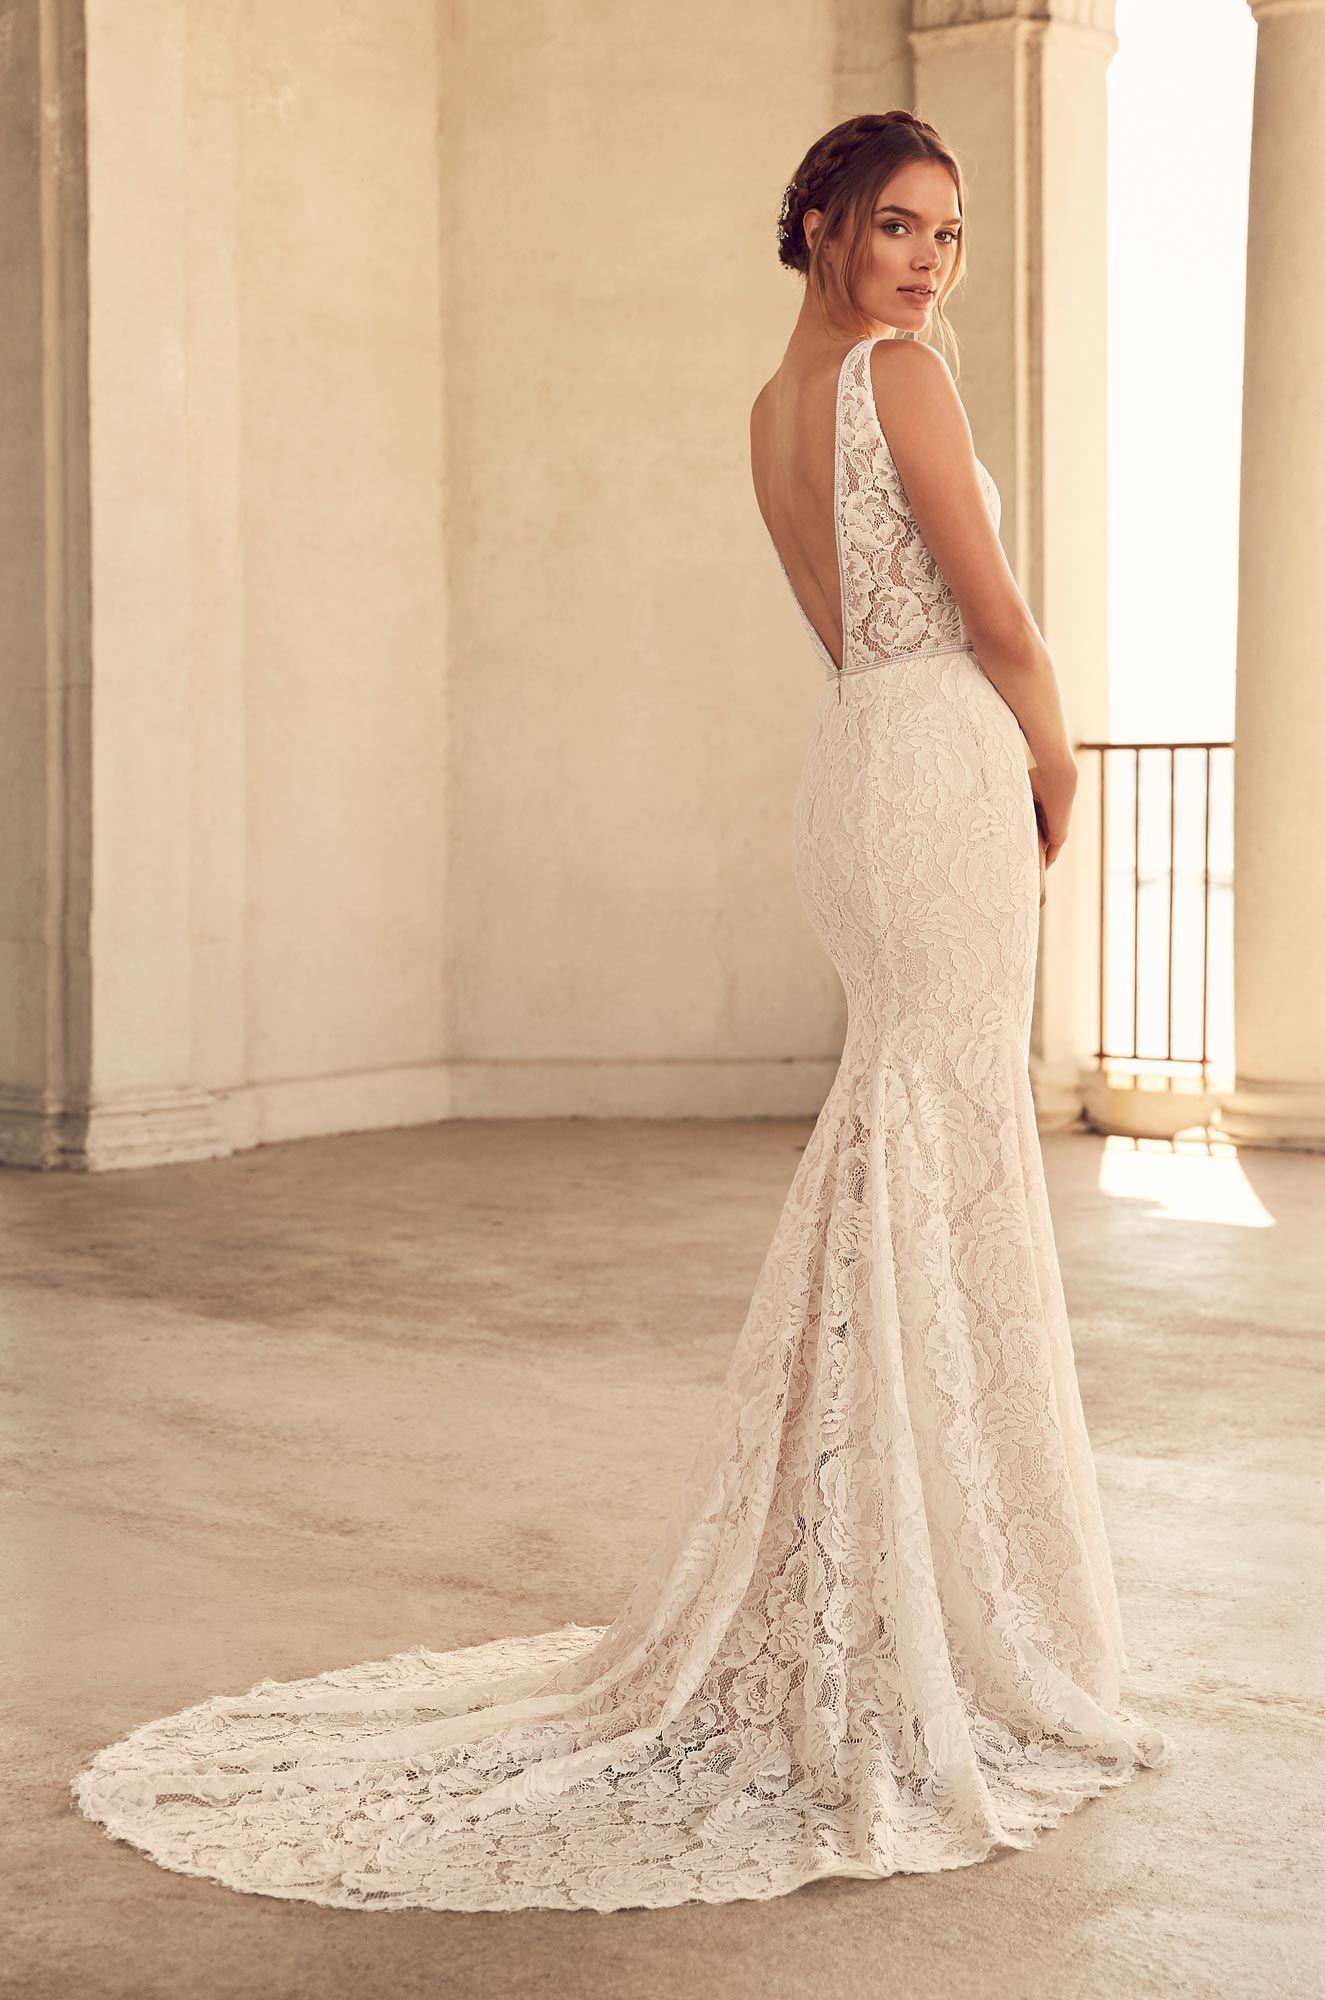 c4926b9cfc0e5 Style 4792 | Paloma #Lace #WeddingDress. Paloma Lace bodice with plunging  neckline and beaded edging around neckline and waist.